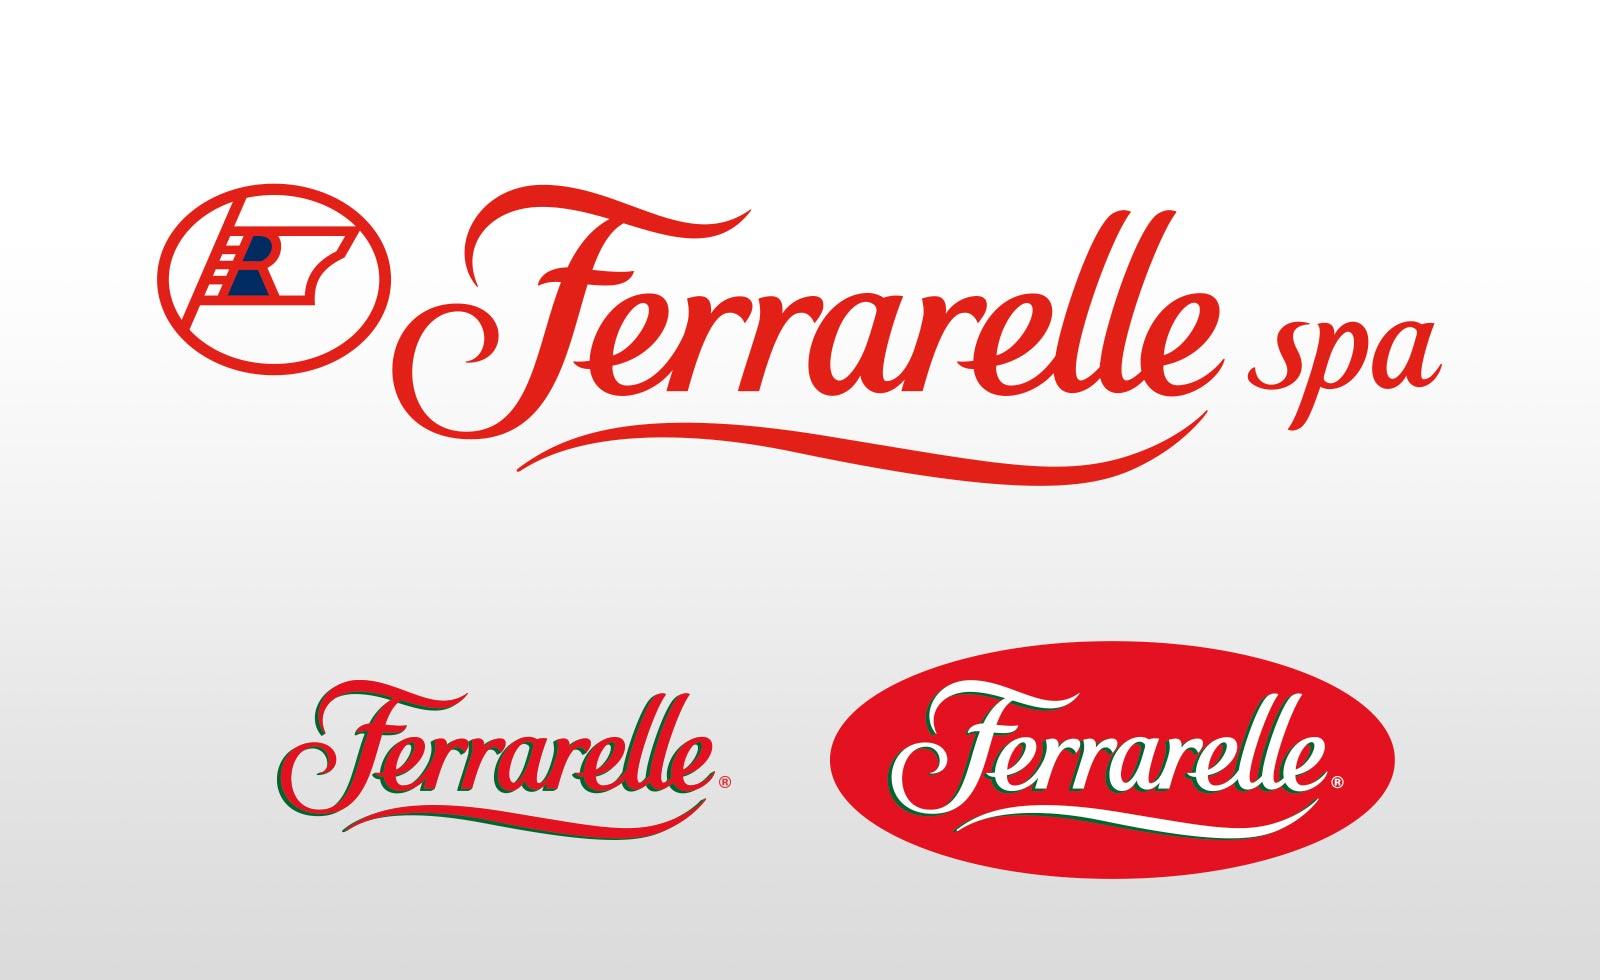 ferrarelle corporate branding